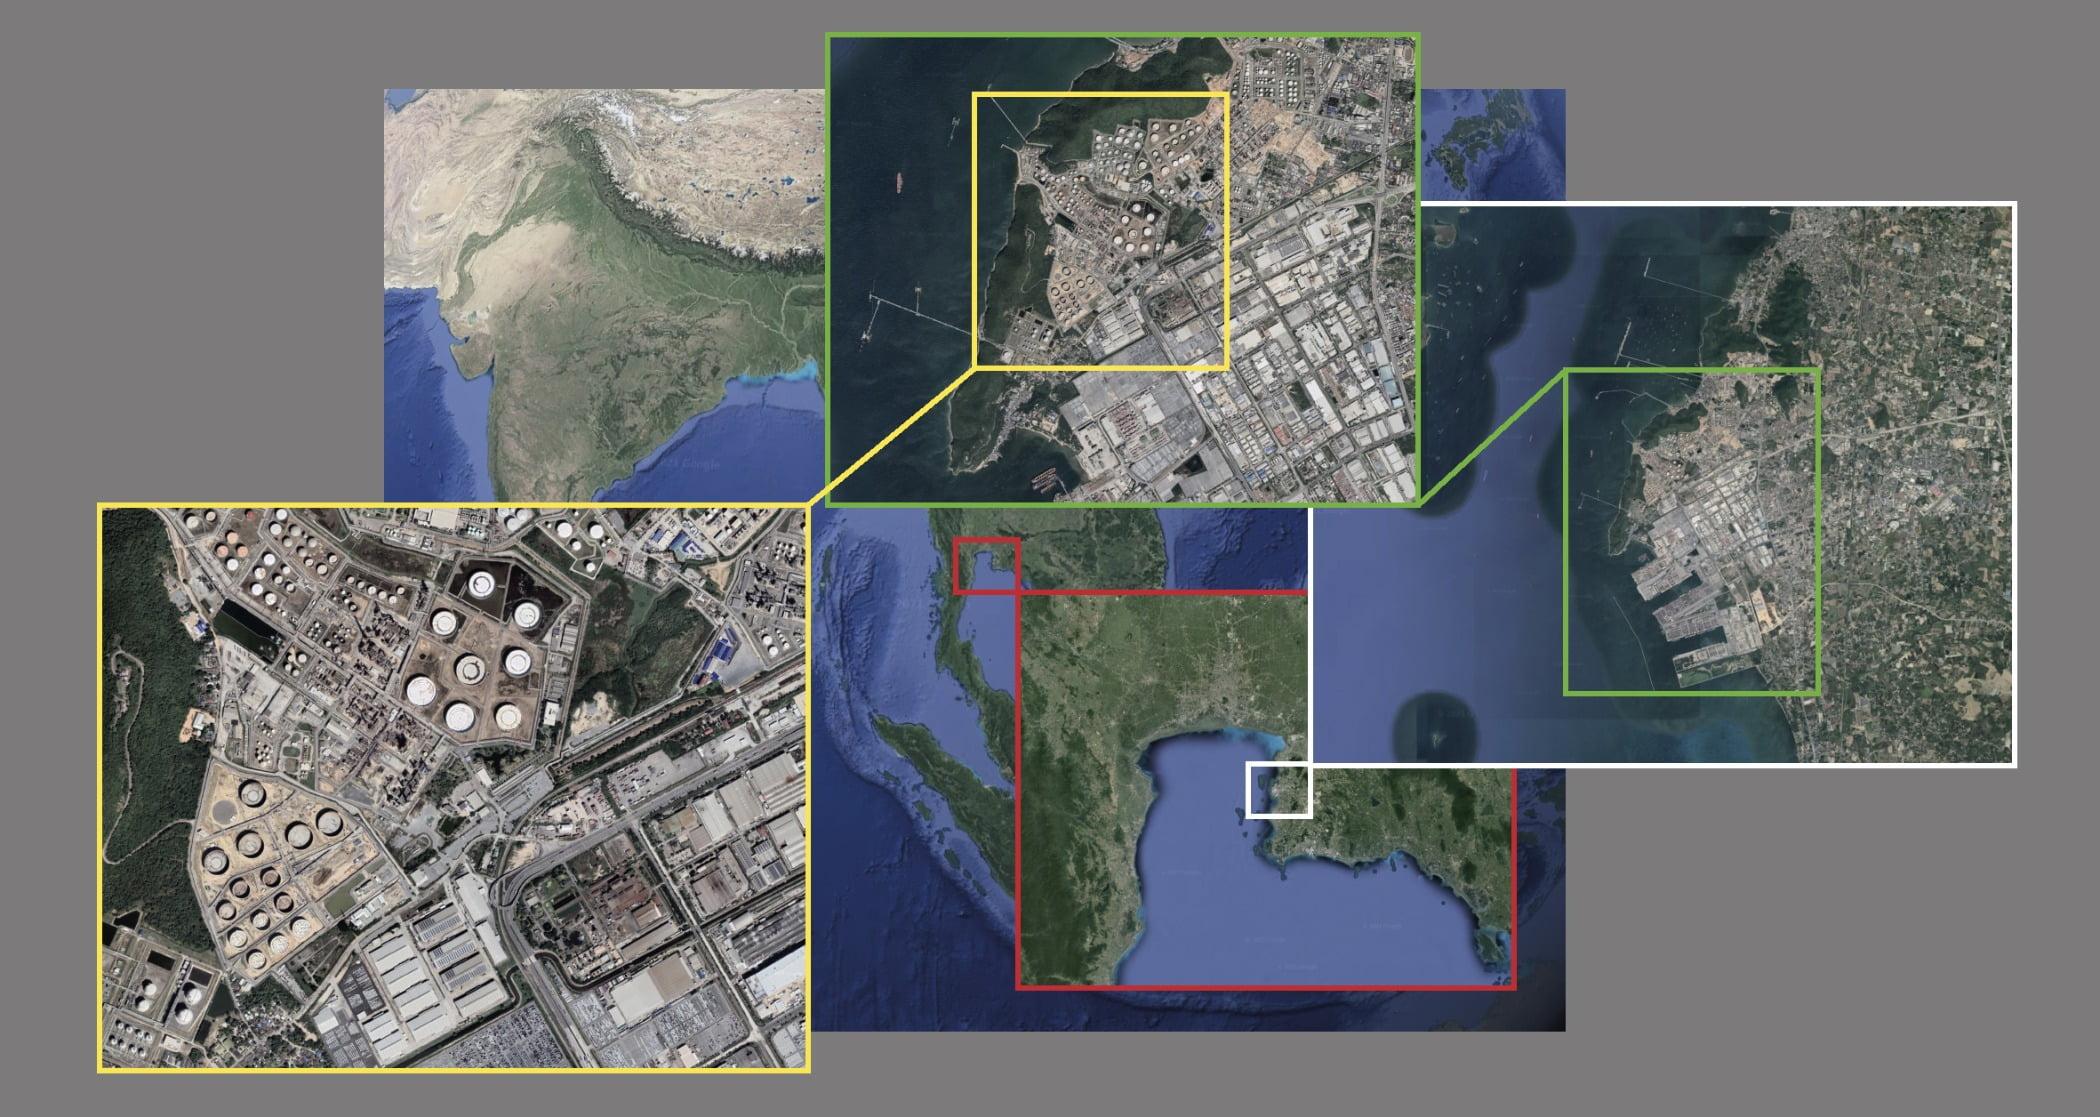 Water resources, Natural environment, Urban design, Terrestrial plant, Property, Map, World, Ecoregion, Vegetation, Watercourse